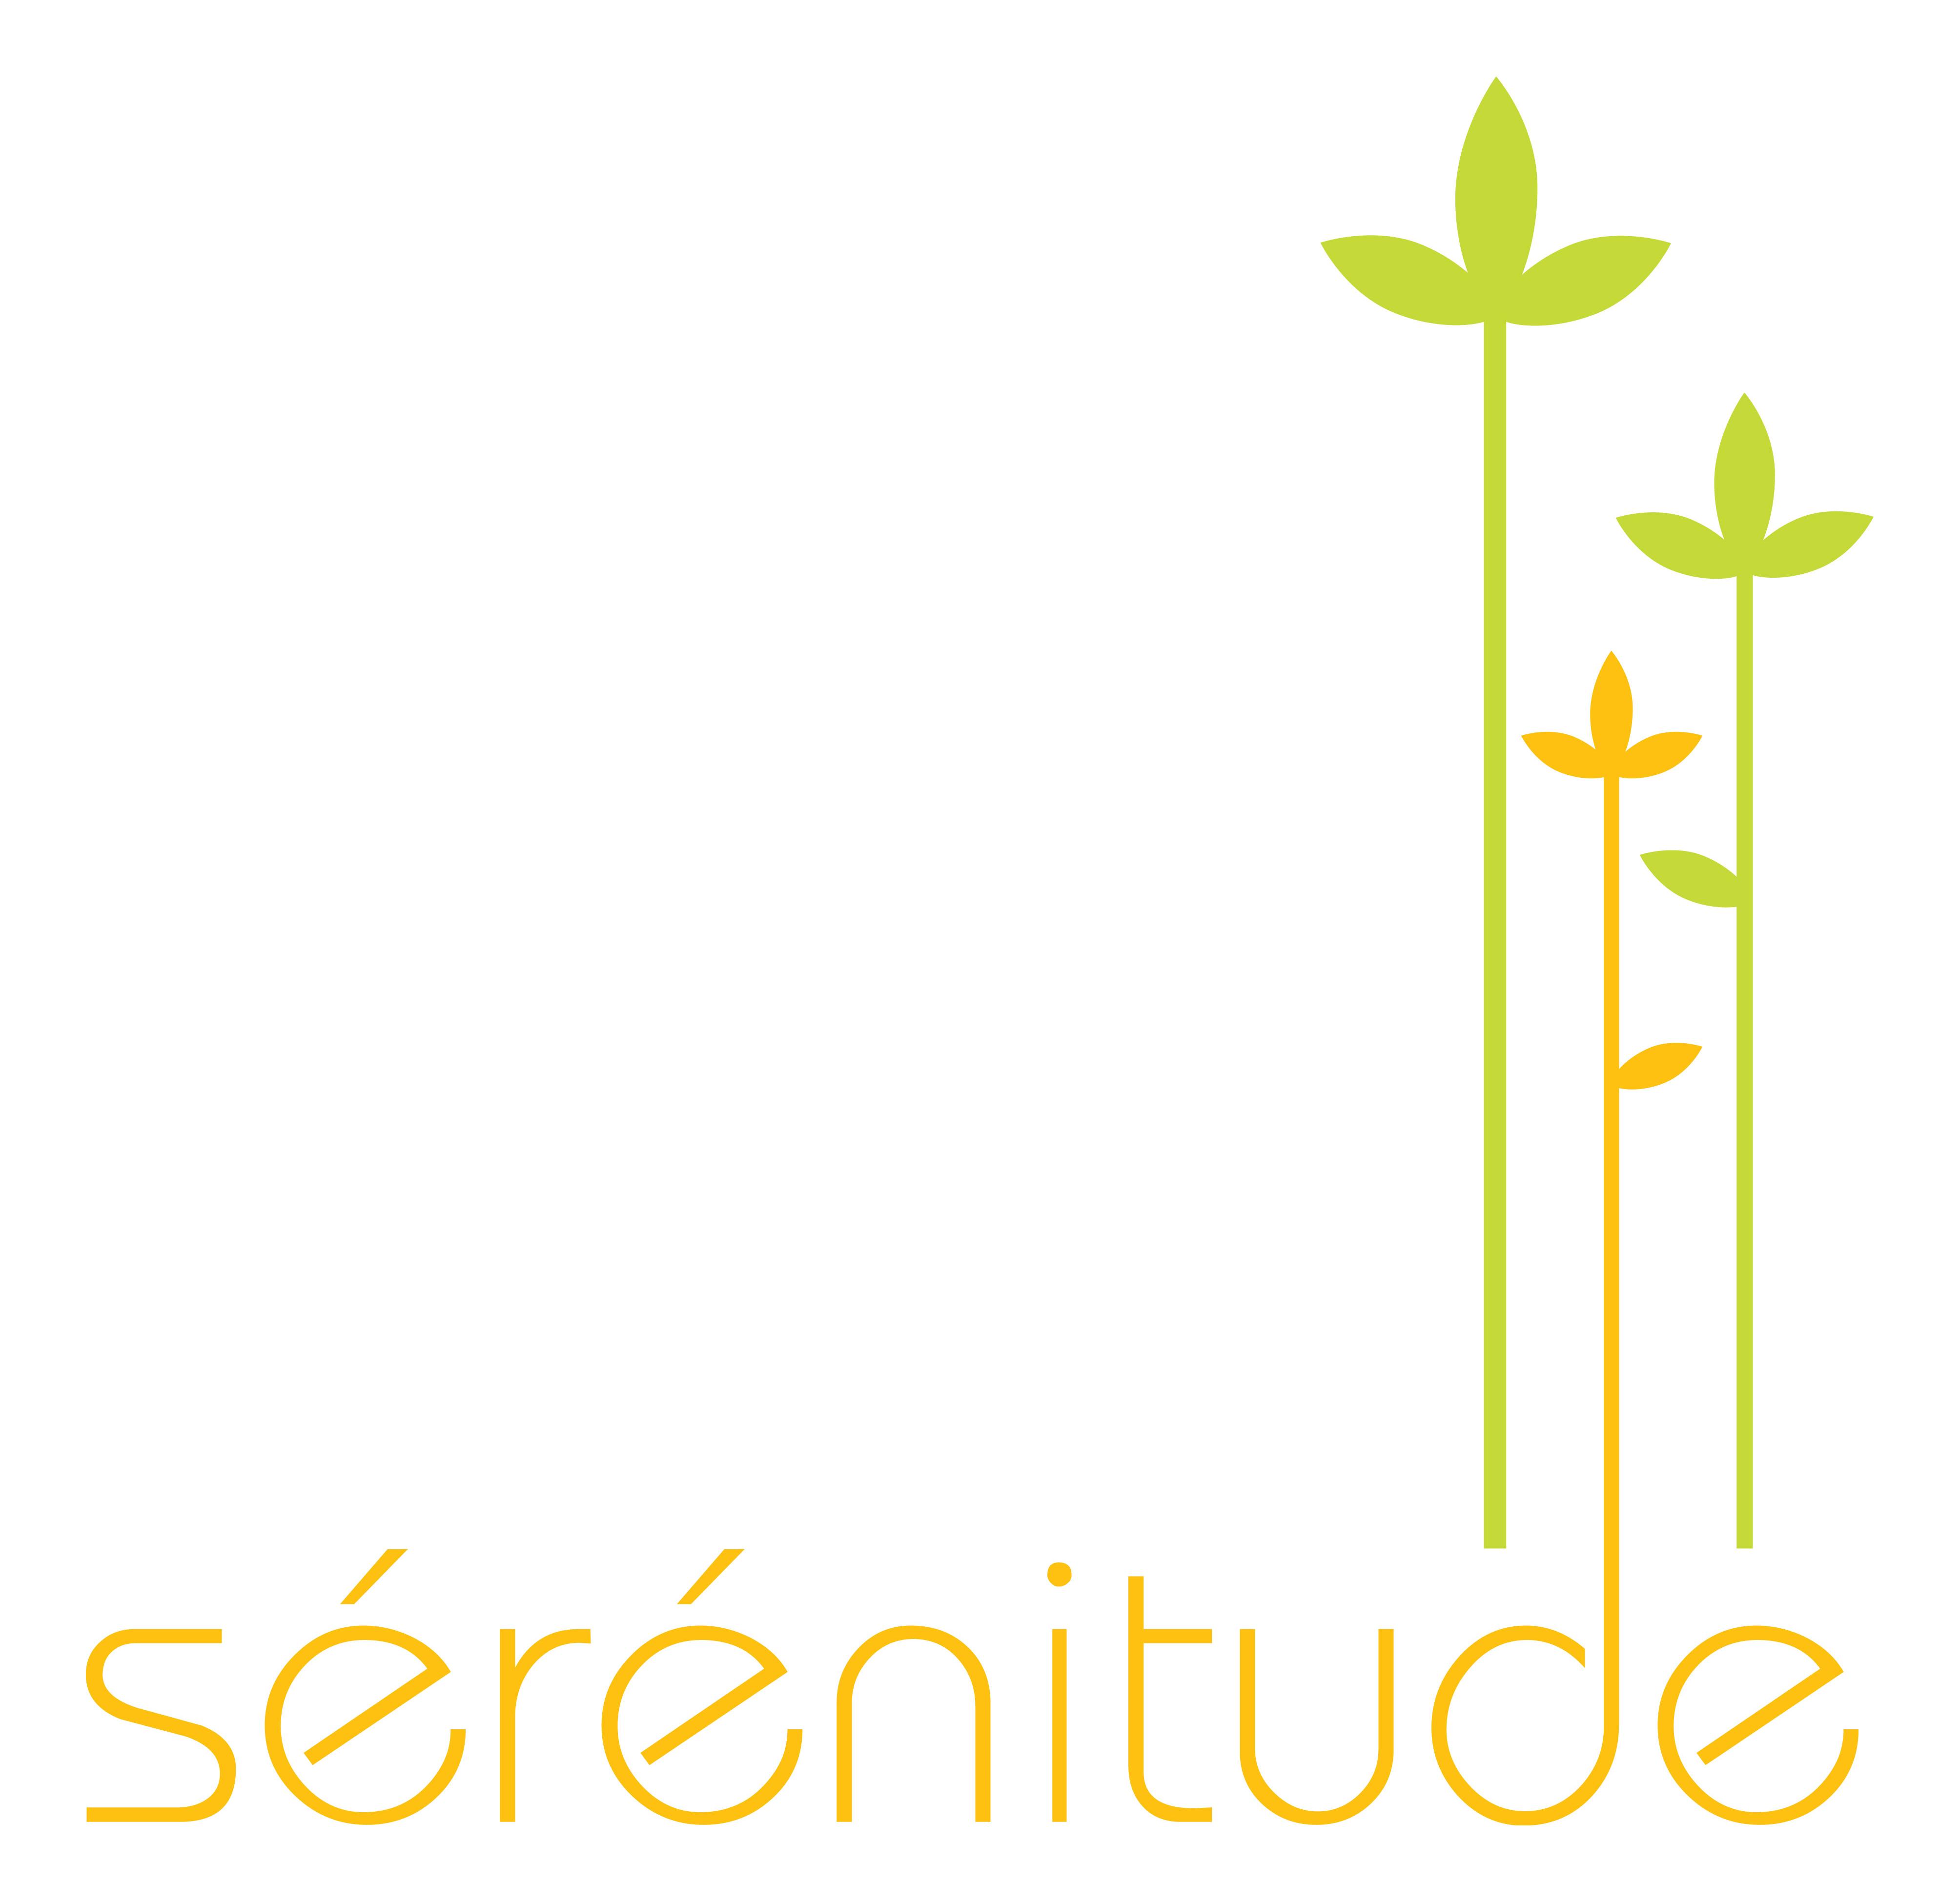 Serenitude